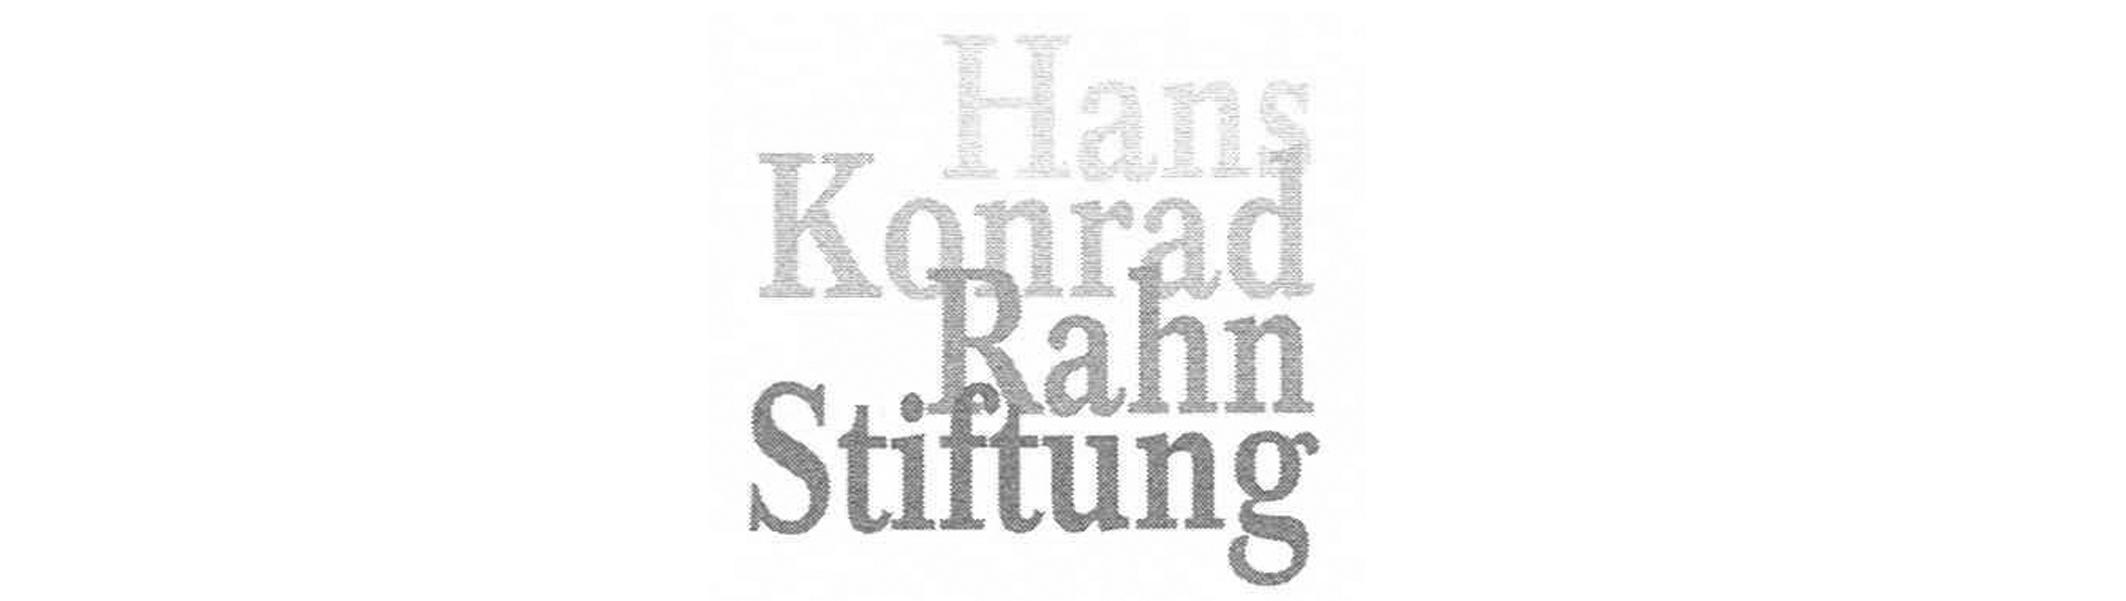 logo_hans_konrad_rahn_stiftung